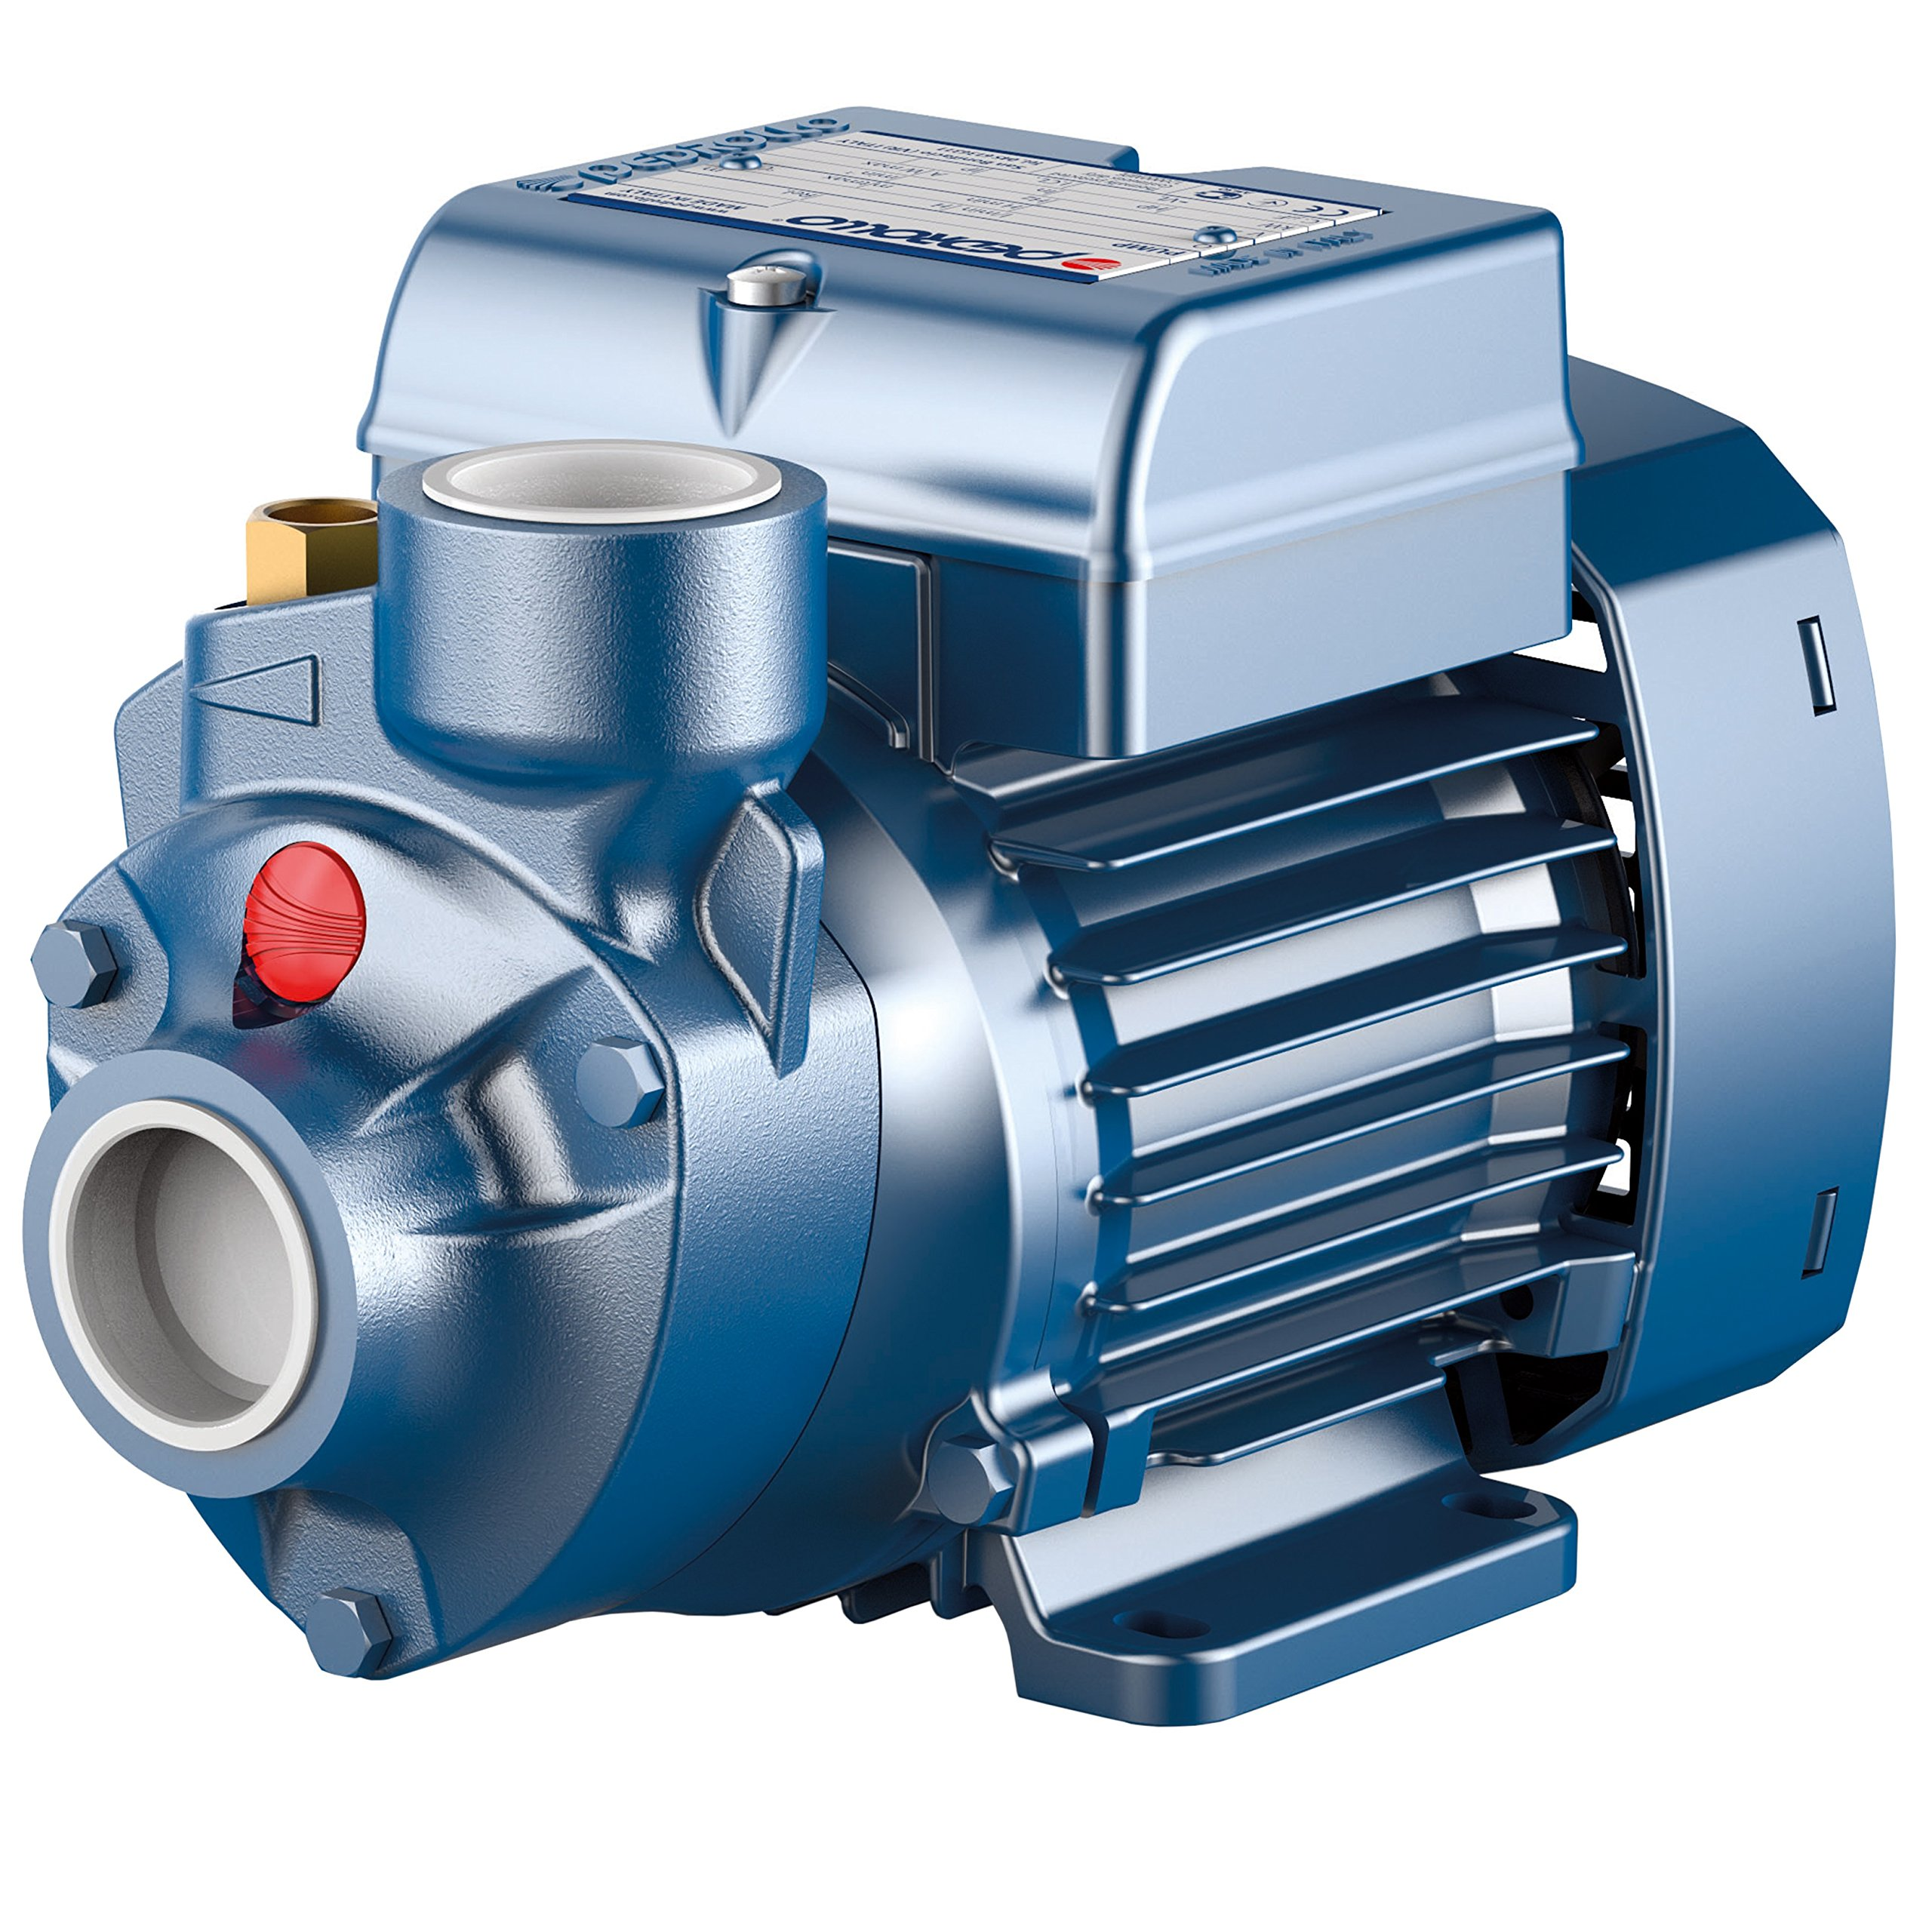 Pedrollo Booster Water Pump — 634 GPH, 1/2 HP, 115 Volts, Model# PKm60